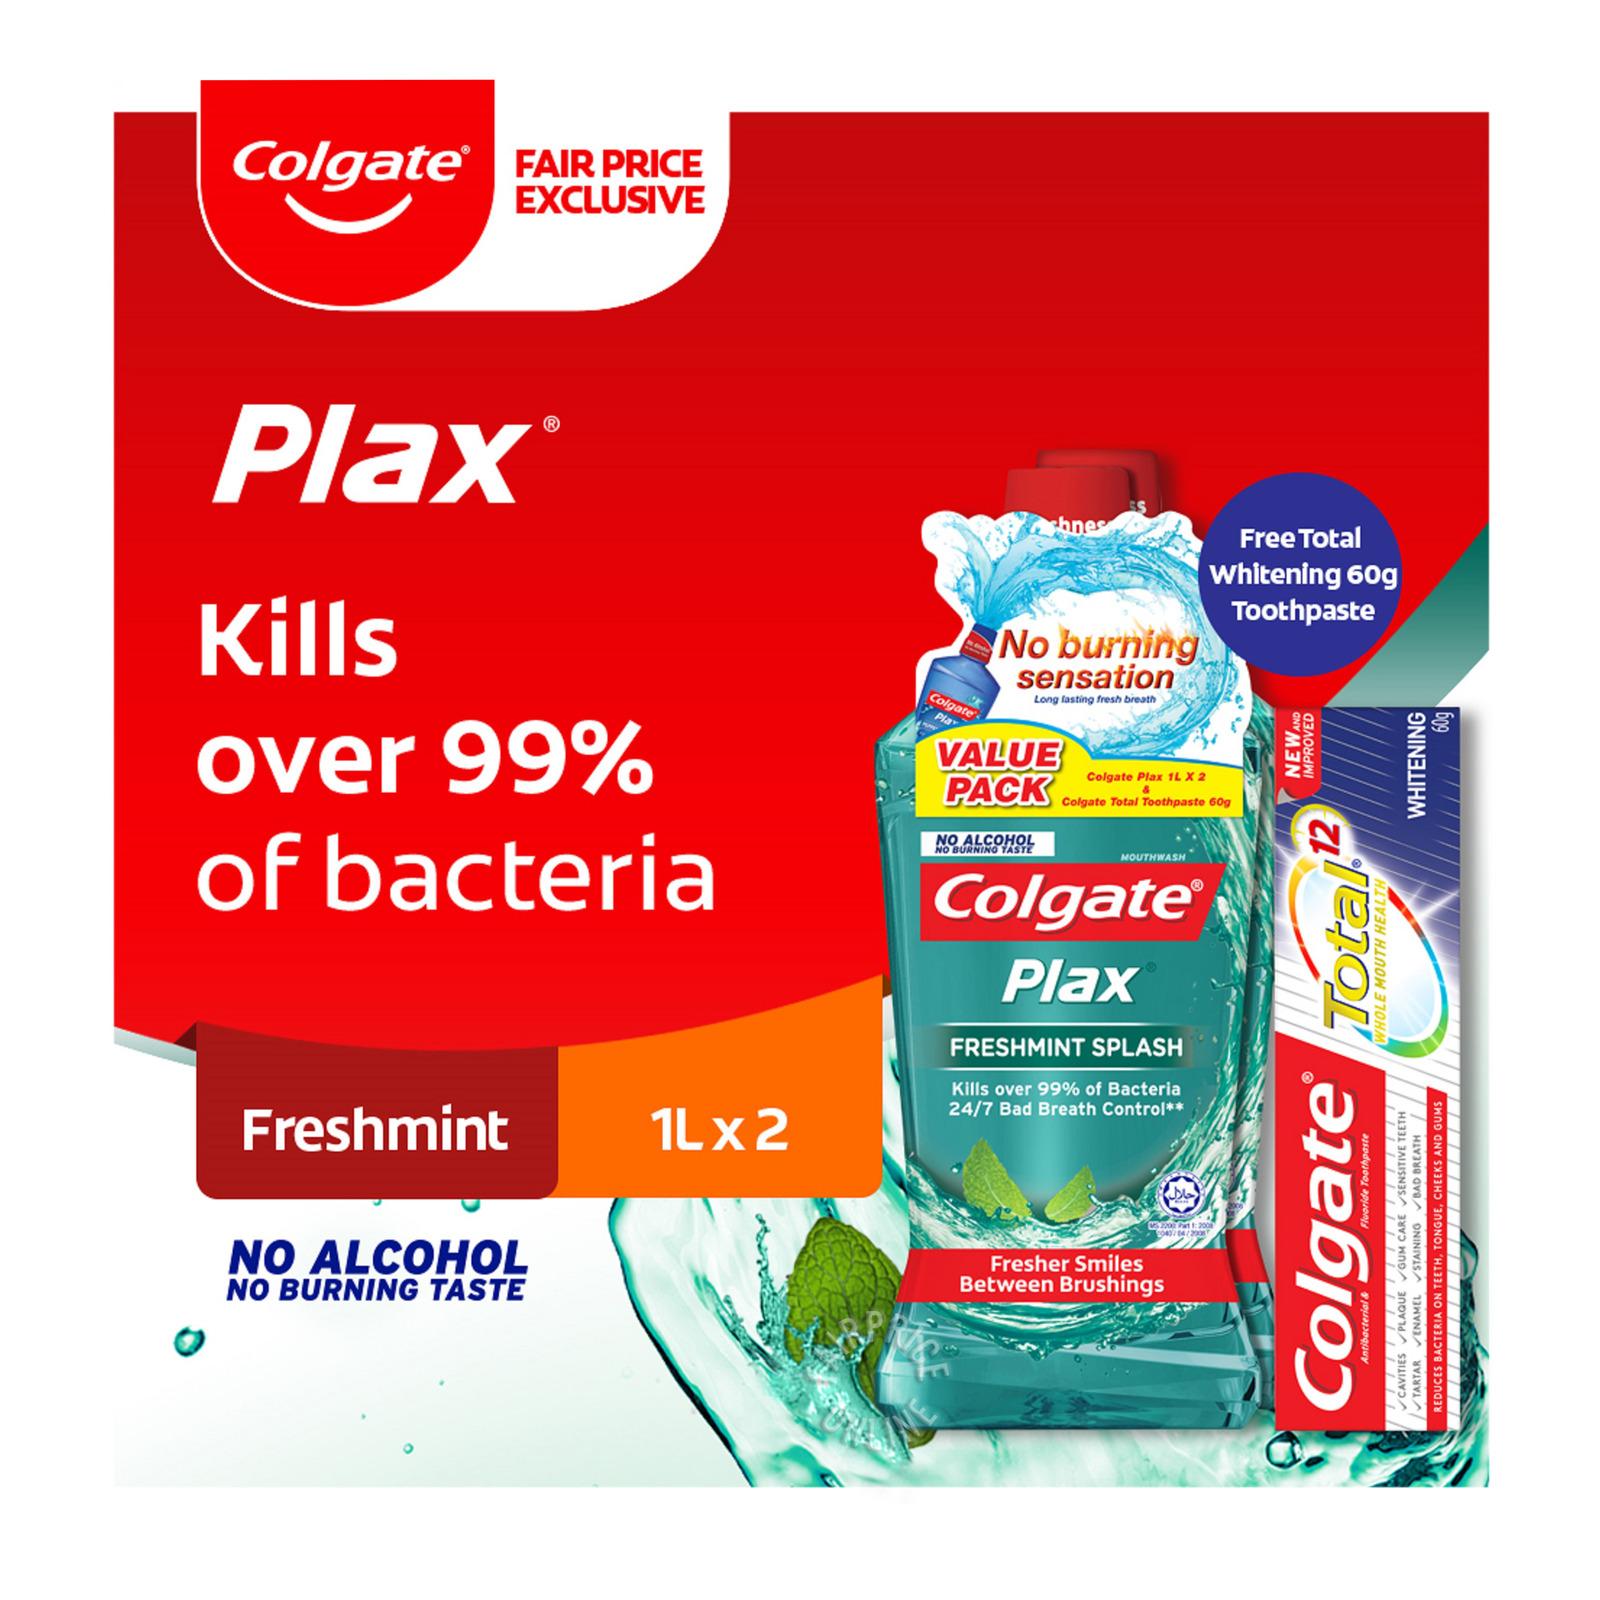 Colgate Plax Mouthwash - Freshmint Splash + Free 60gToothpaste